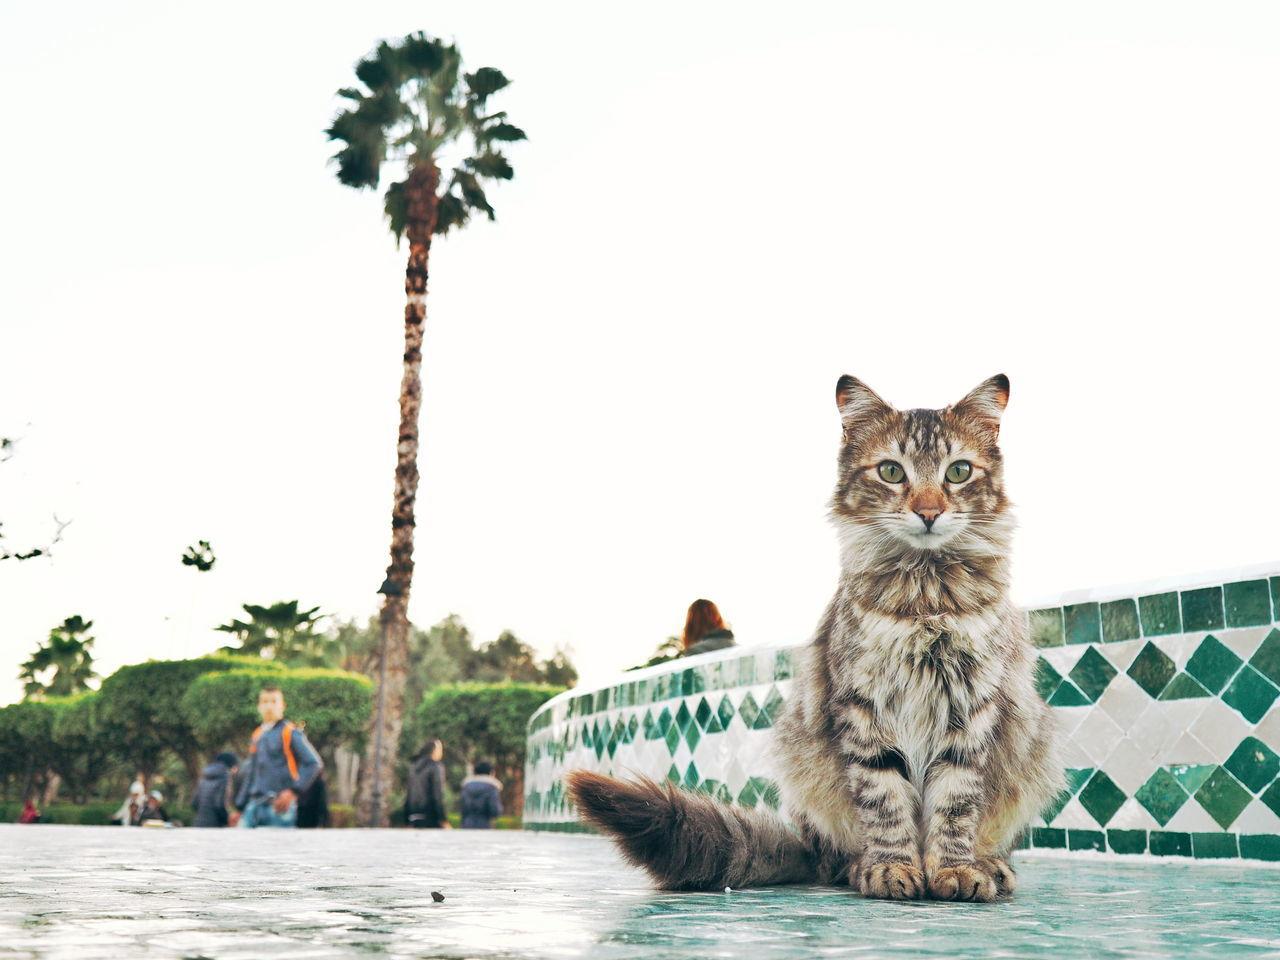 Portrait Of Cat In City